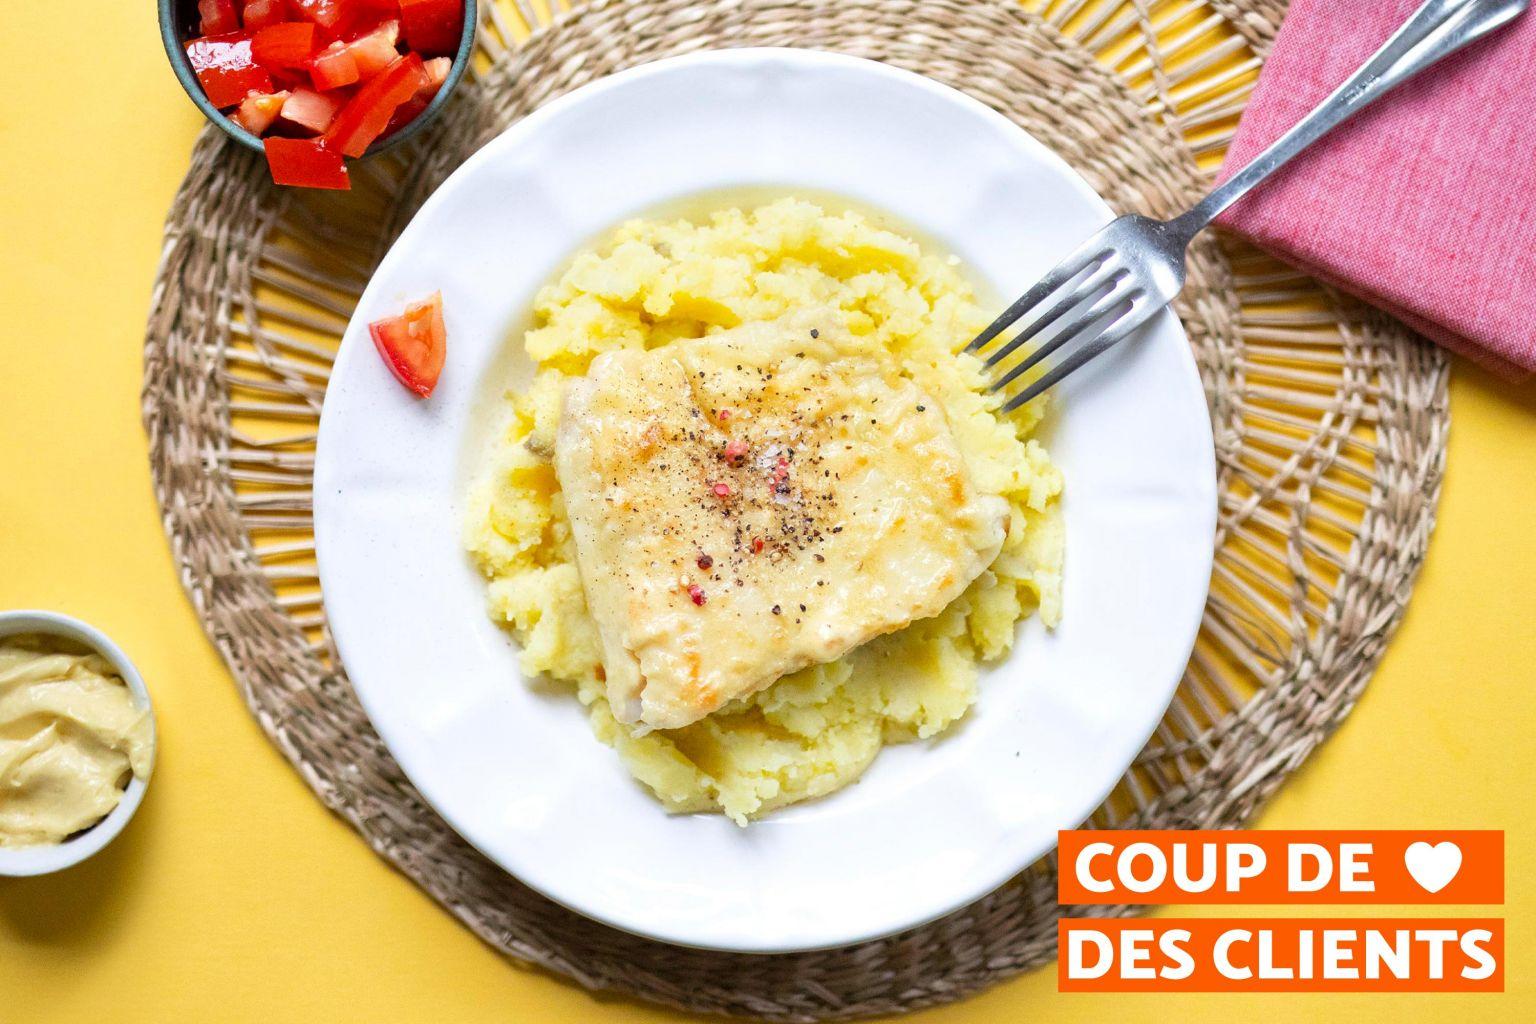 Filet de merlu et beurre moutardé